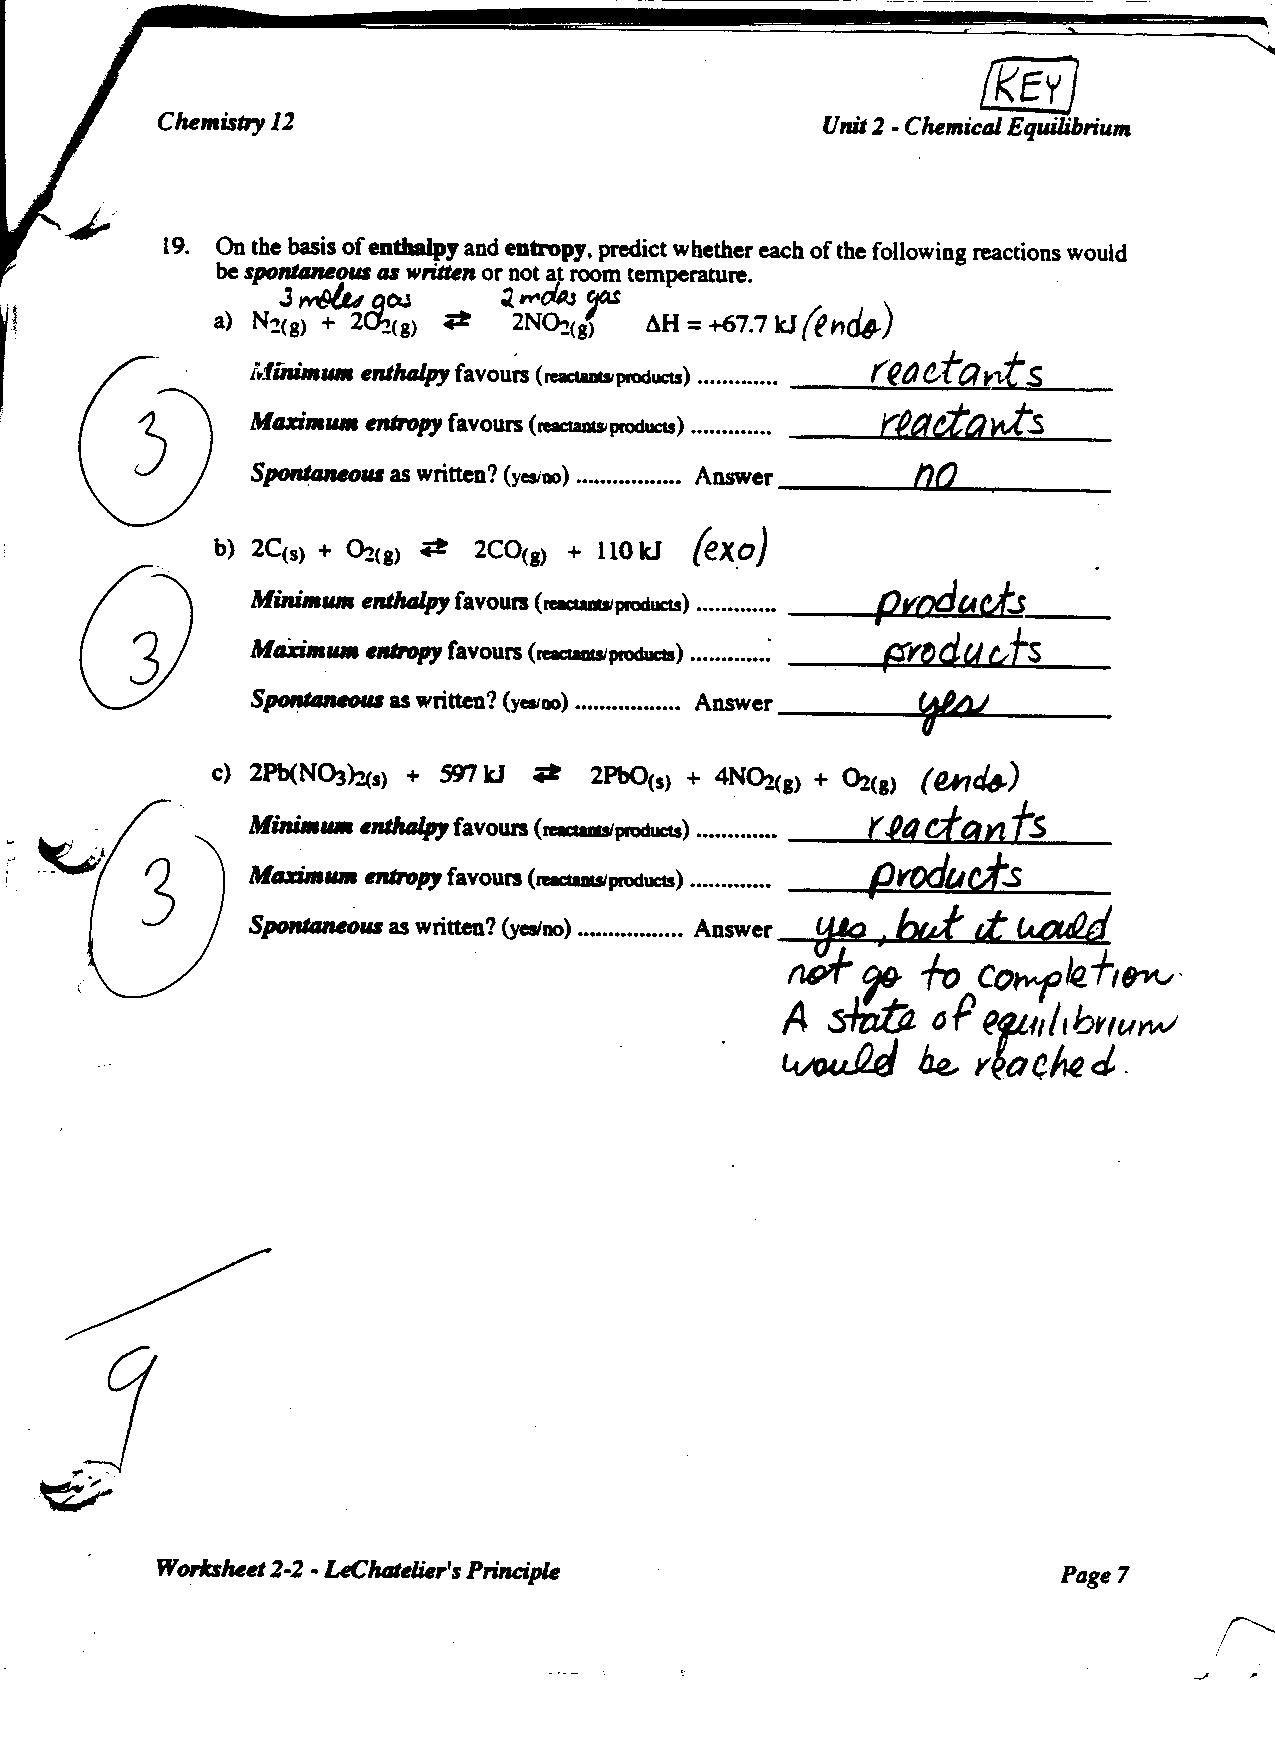 Chemistry Unit 2 Worksheet 1